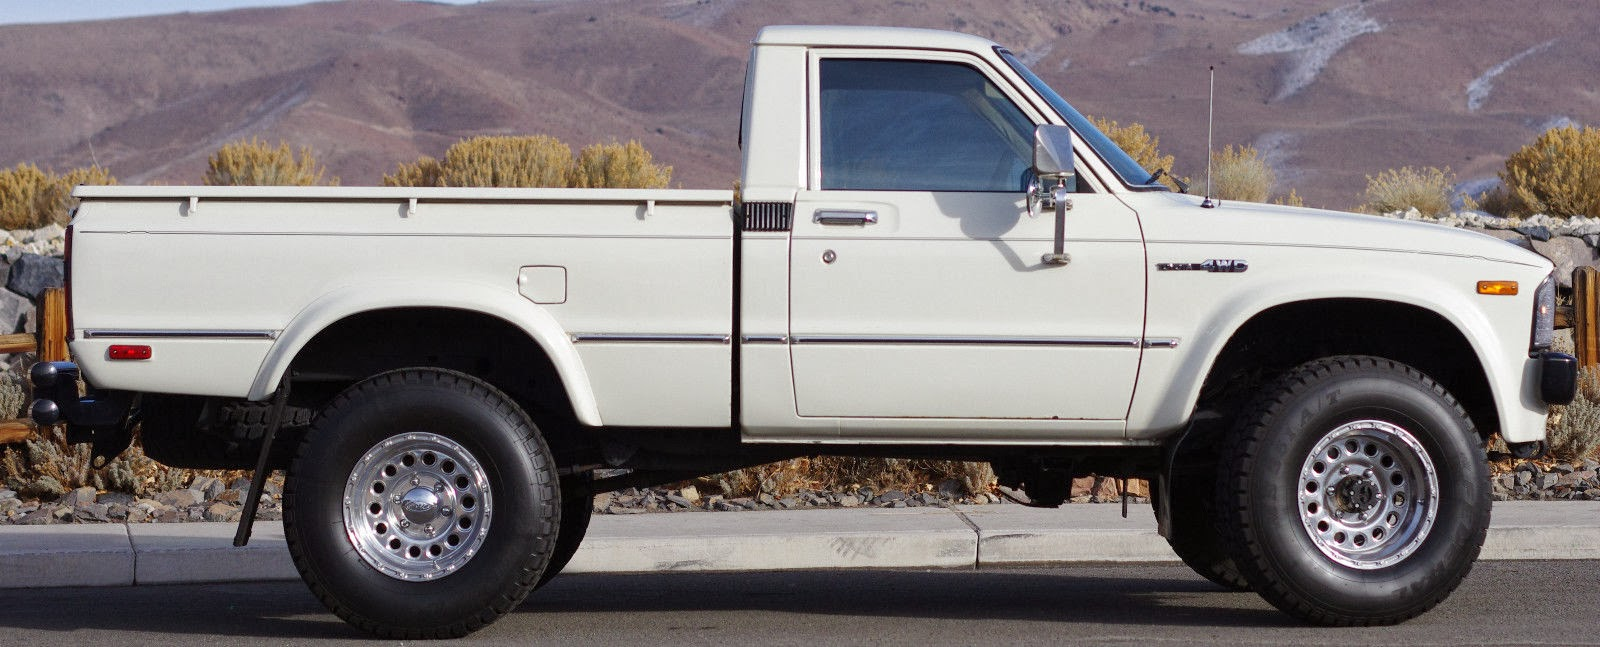 all new camry headlightmag grand veloz silver imv2 hilux | autos weblog